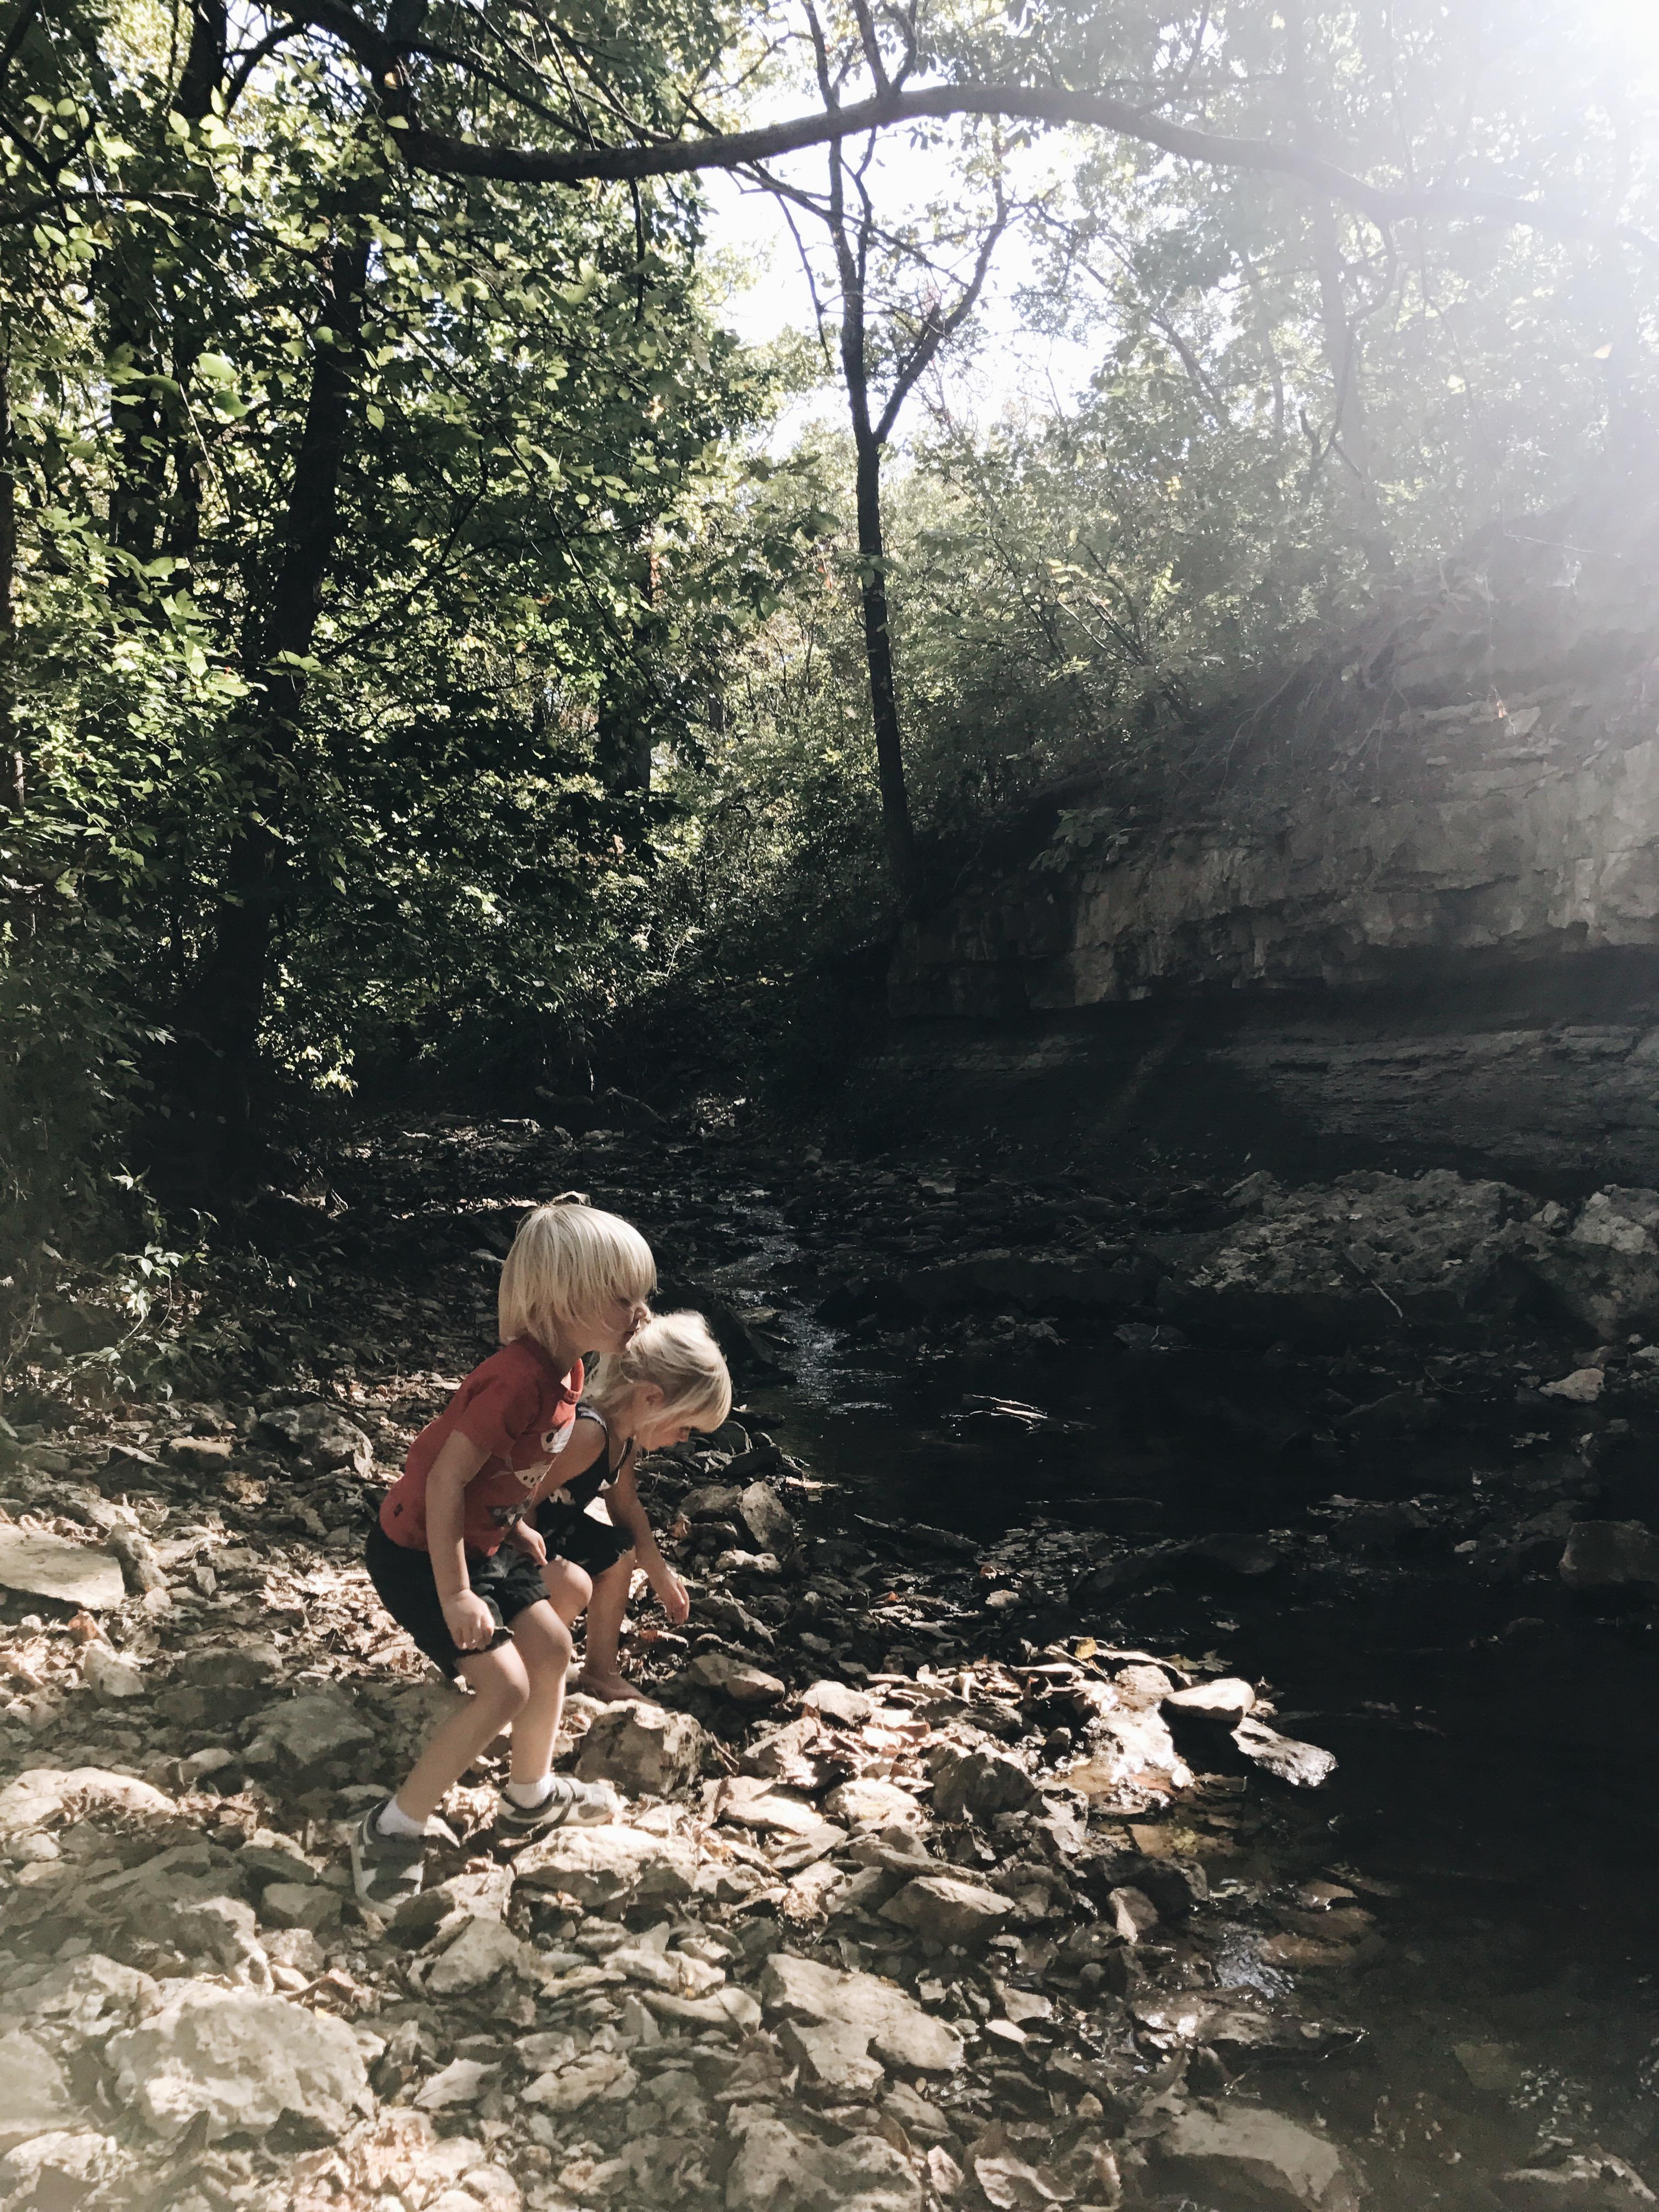 gremlins in nature